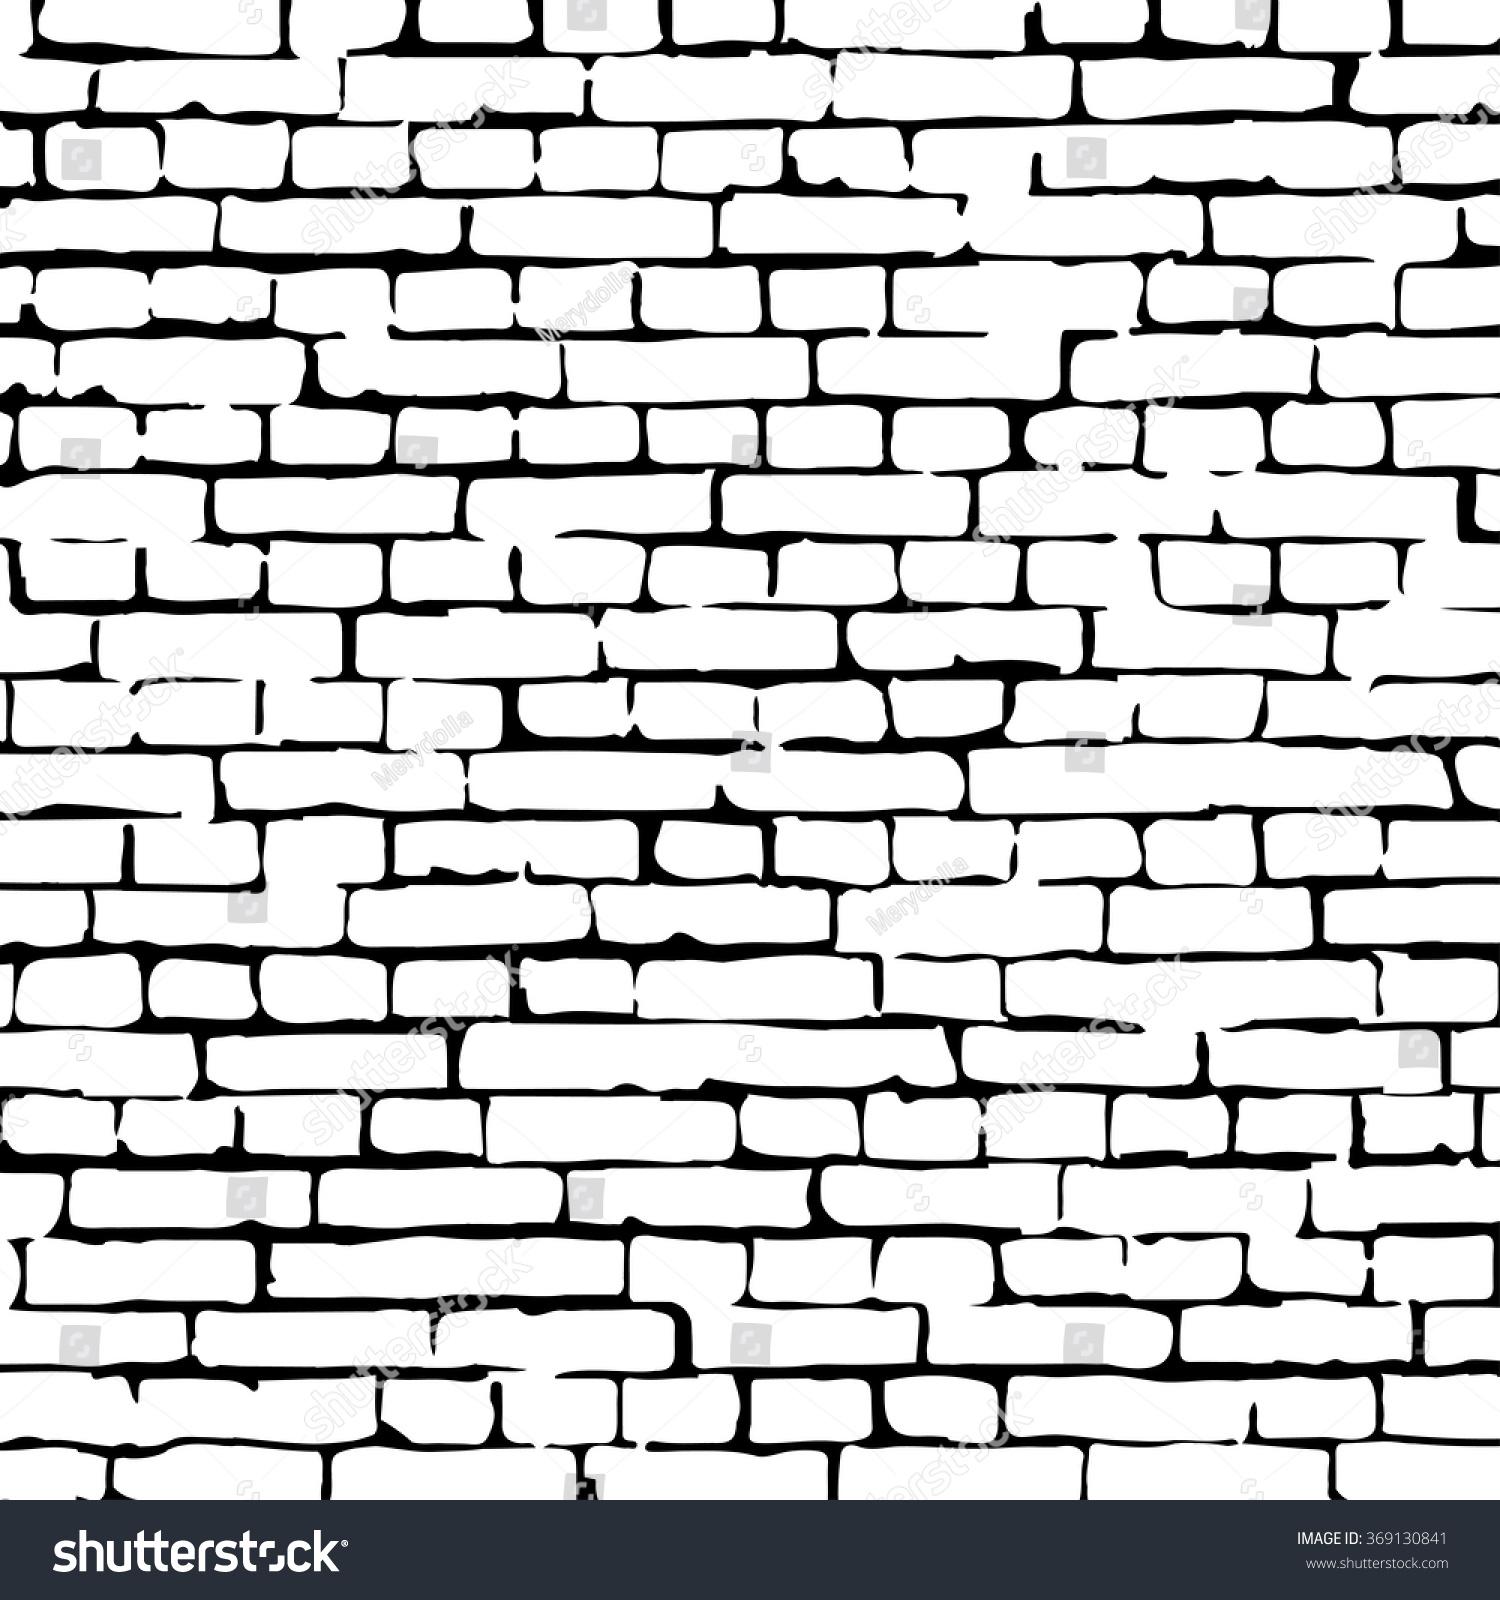 Brick Wall Clip Art: Vector Brick Wall Texture Illustration, Brick Wall Pattern